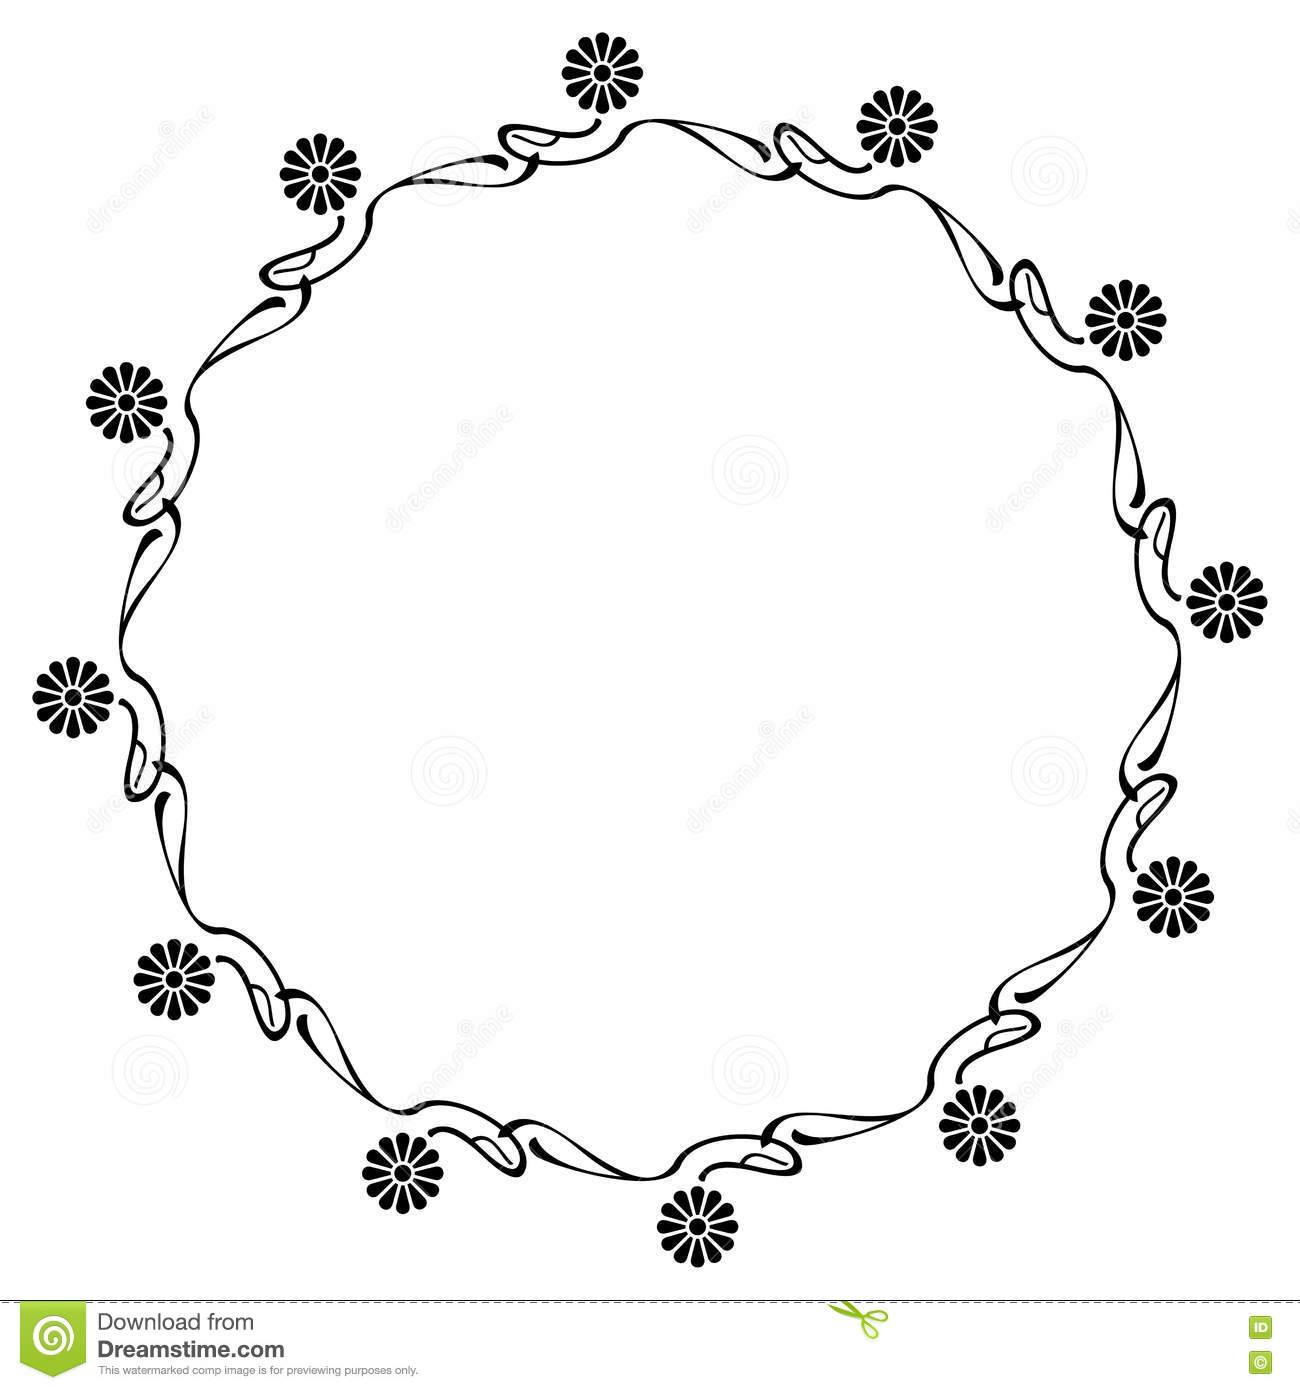 Abstract elegant frame. stock illustration. Illustration of free.